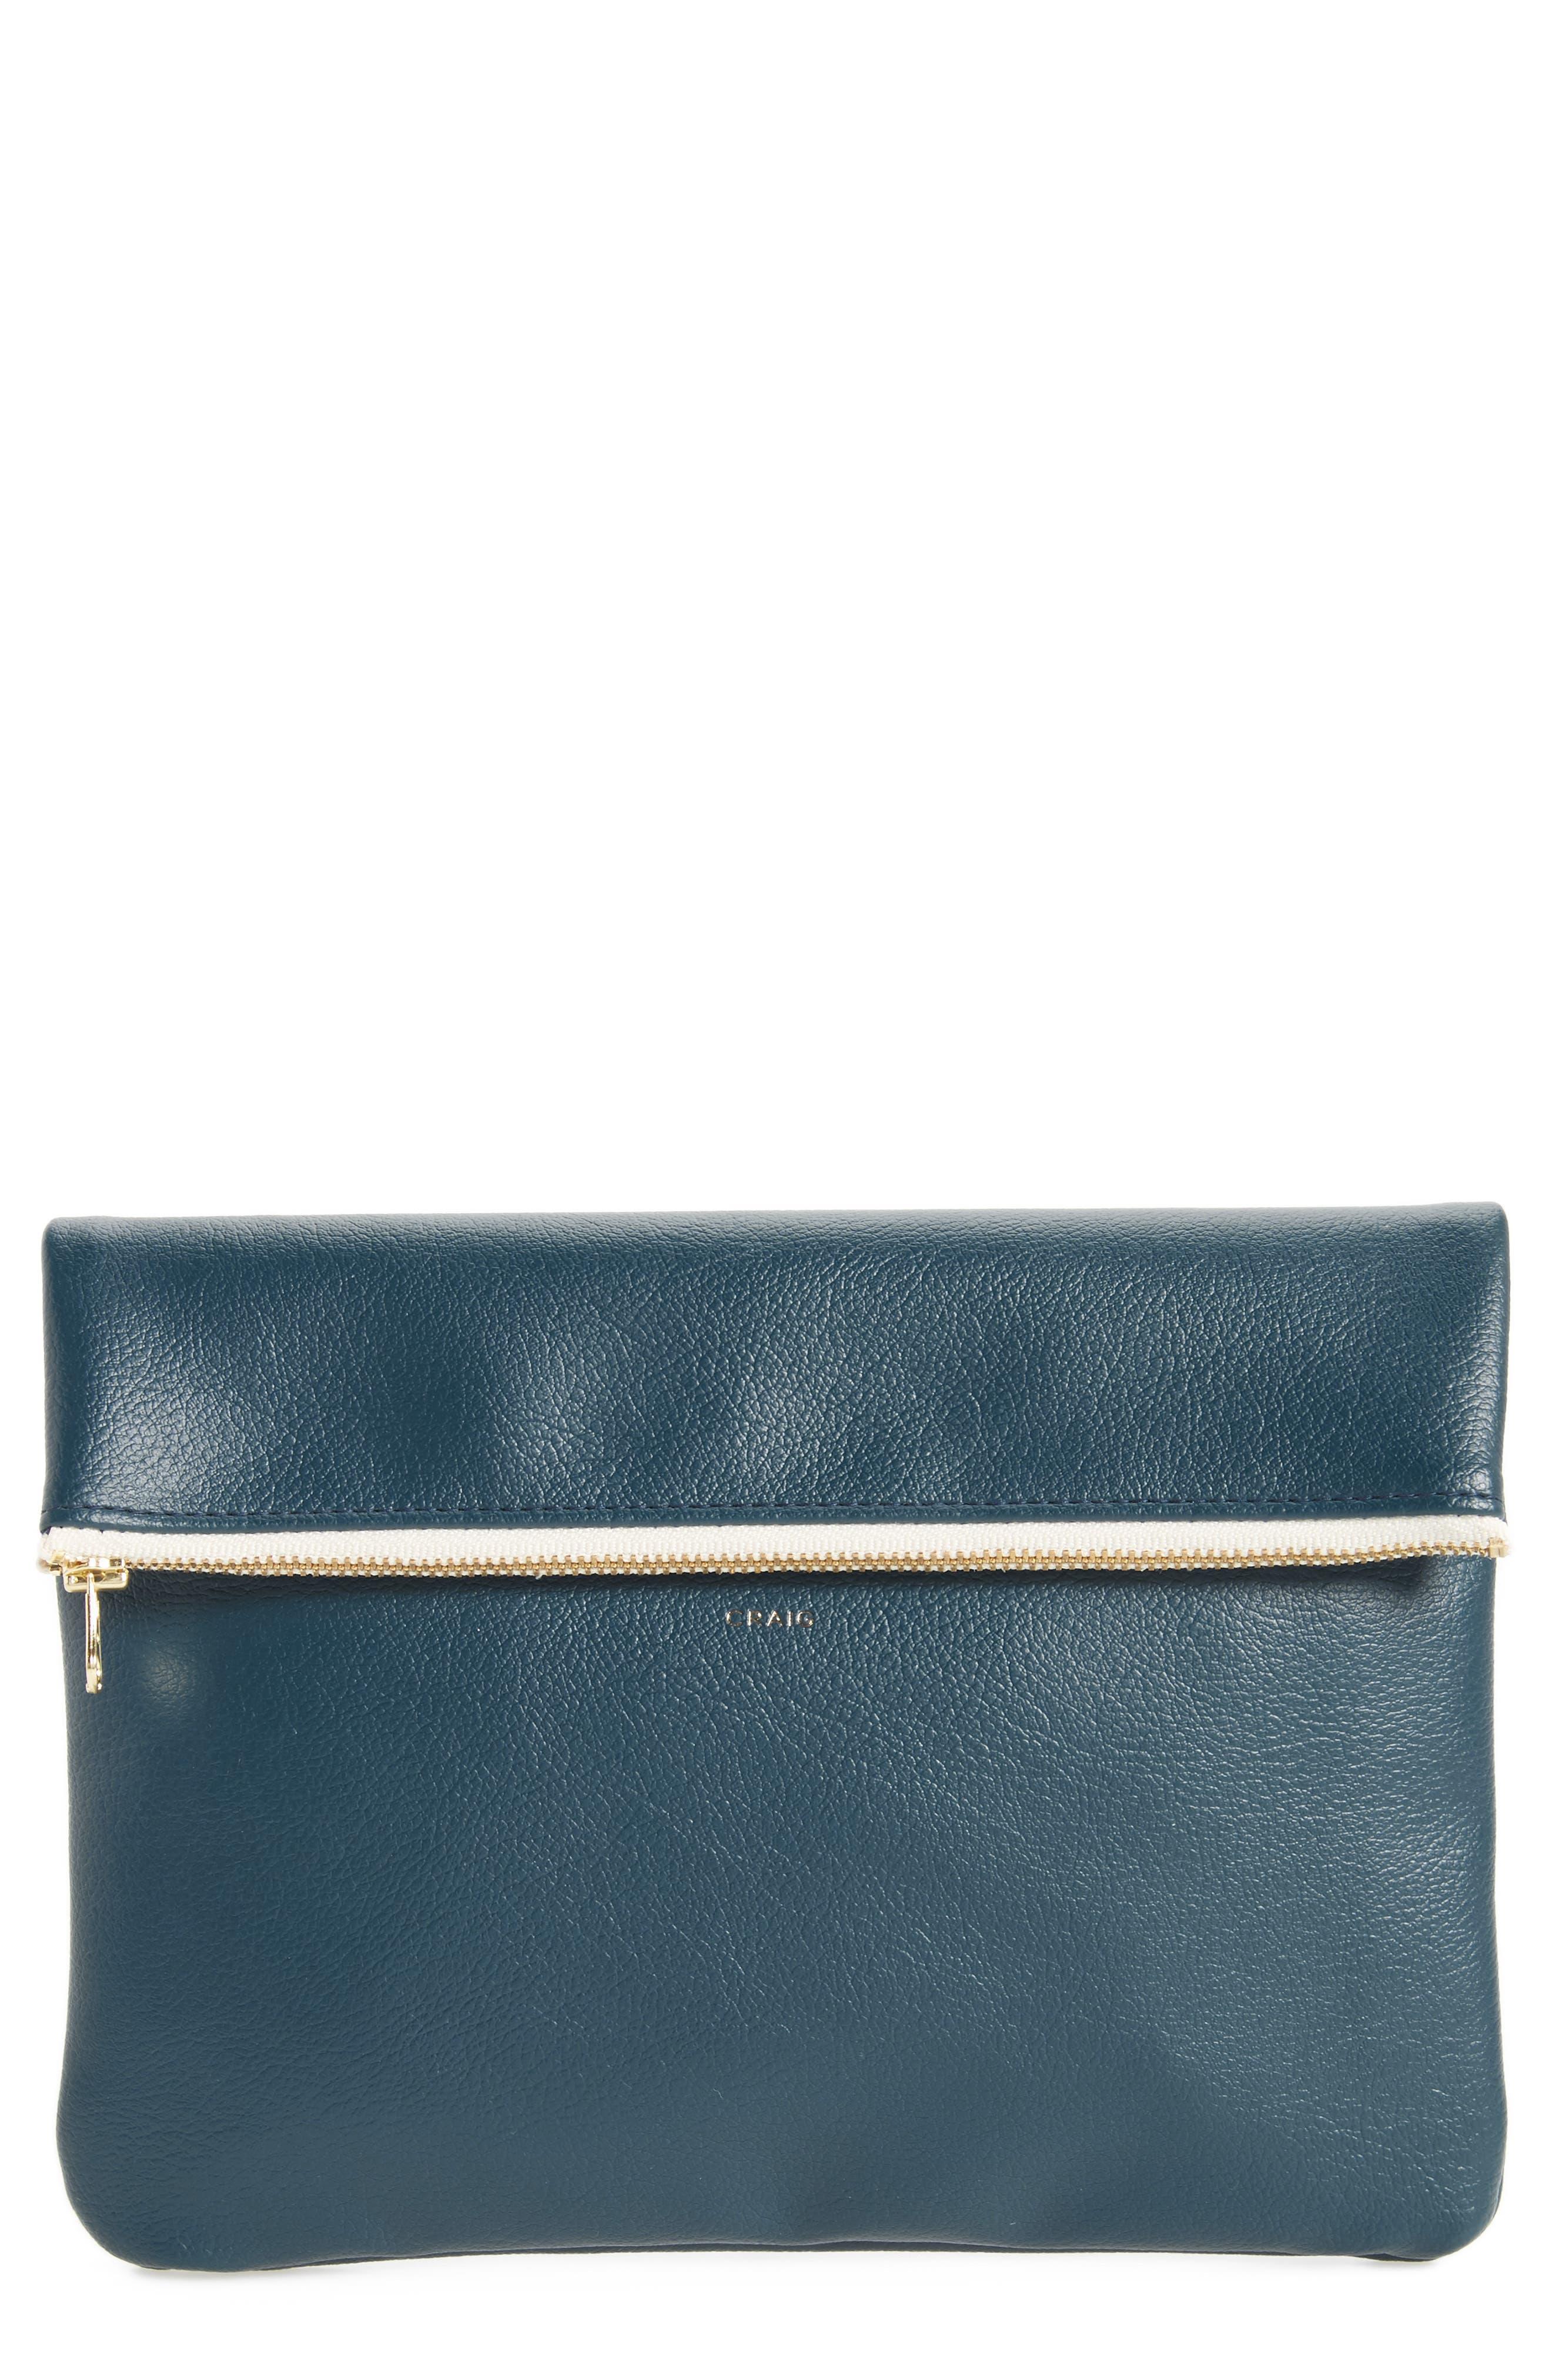 Craig Medium Faux Leather Clutch,                         Main,                         color, 400